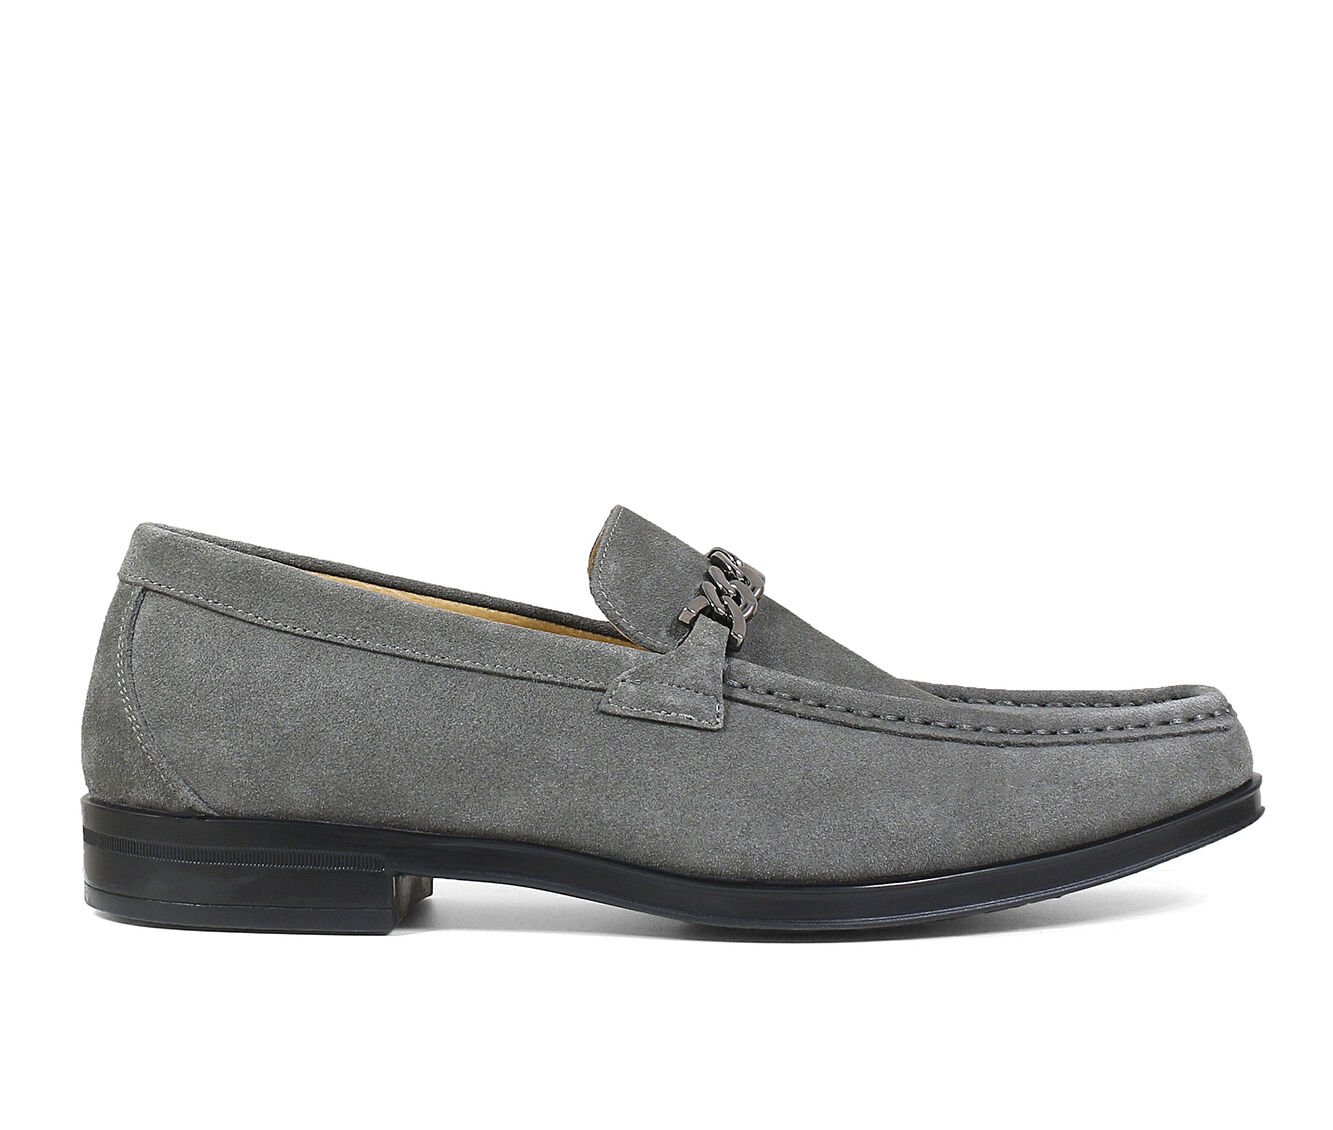 Men's Stacy Adams Norwood Dress Shoes Gray